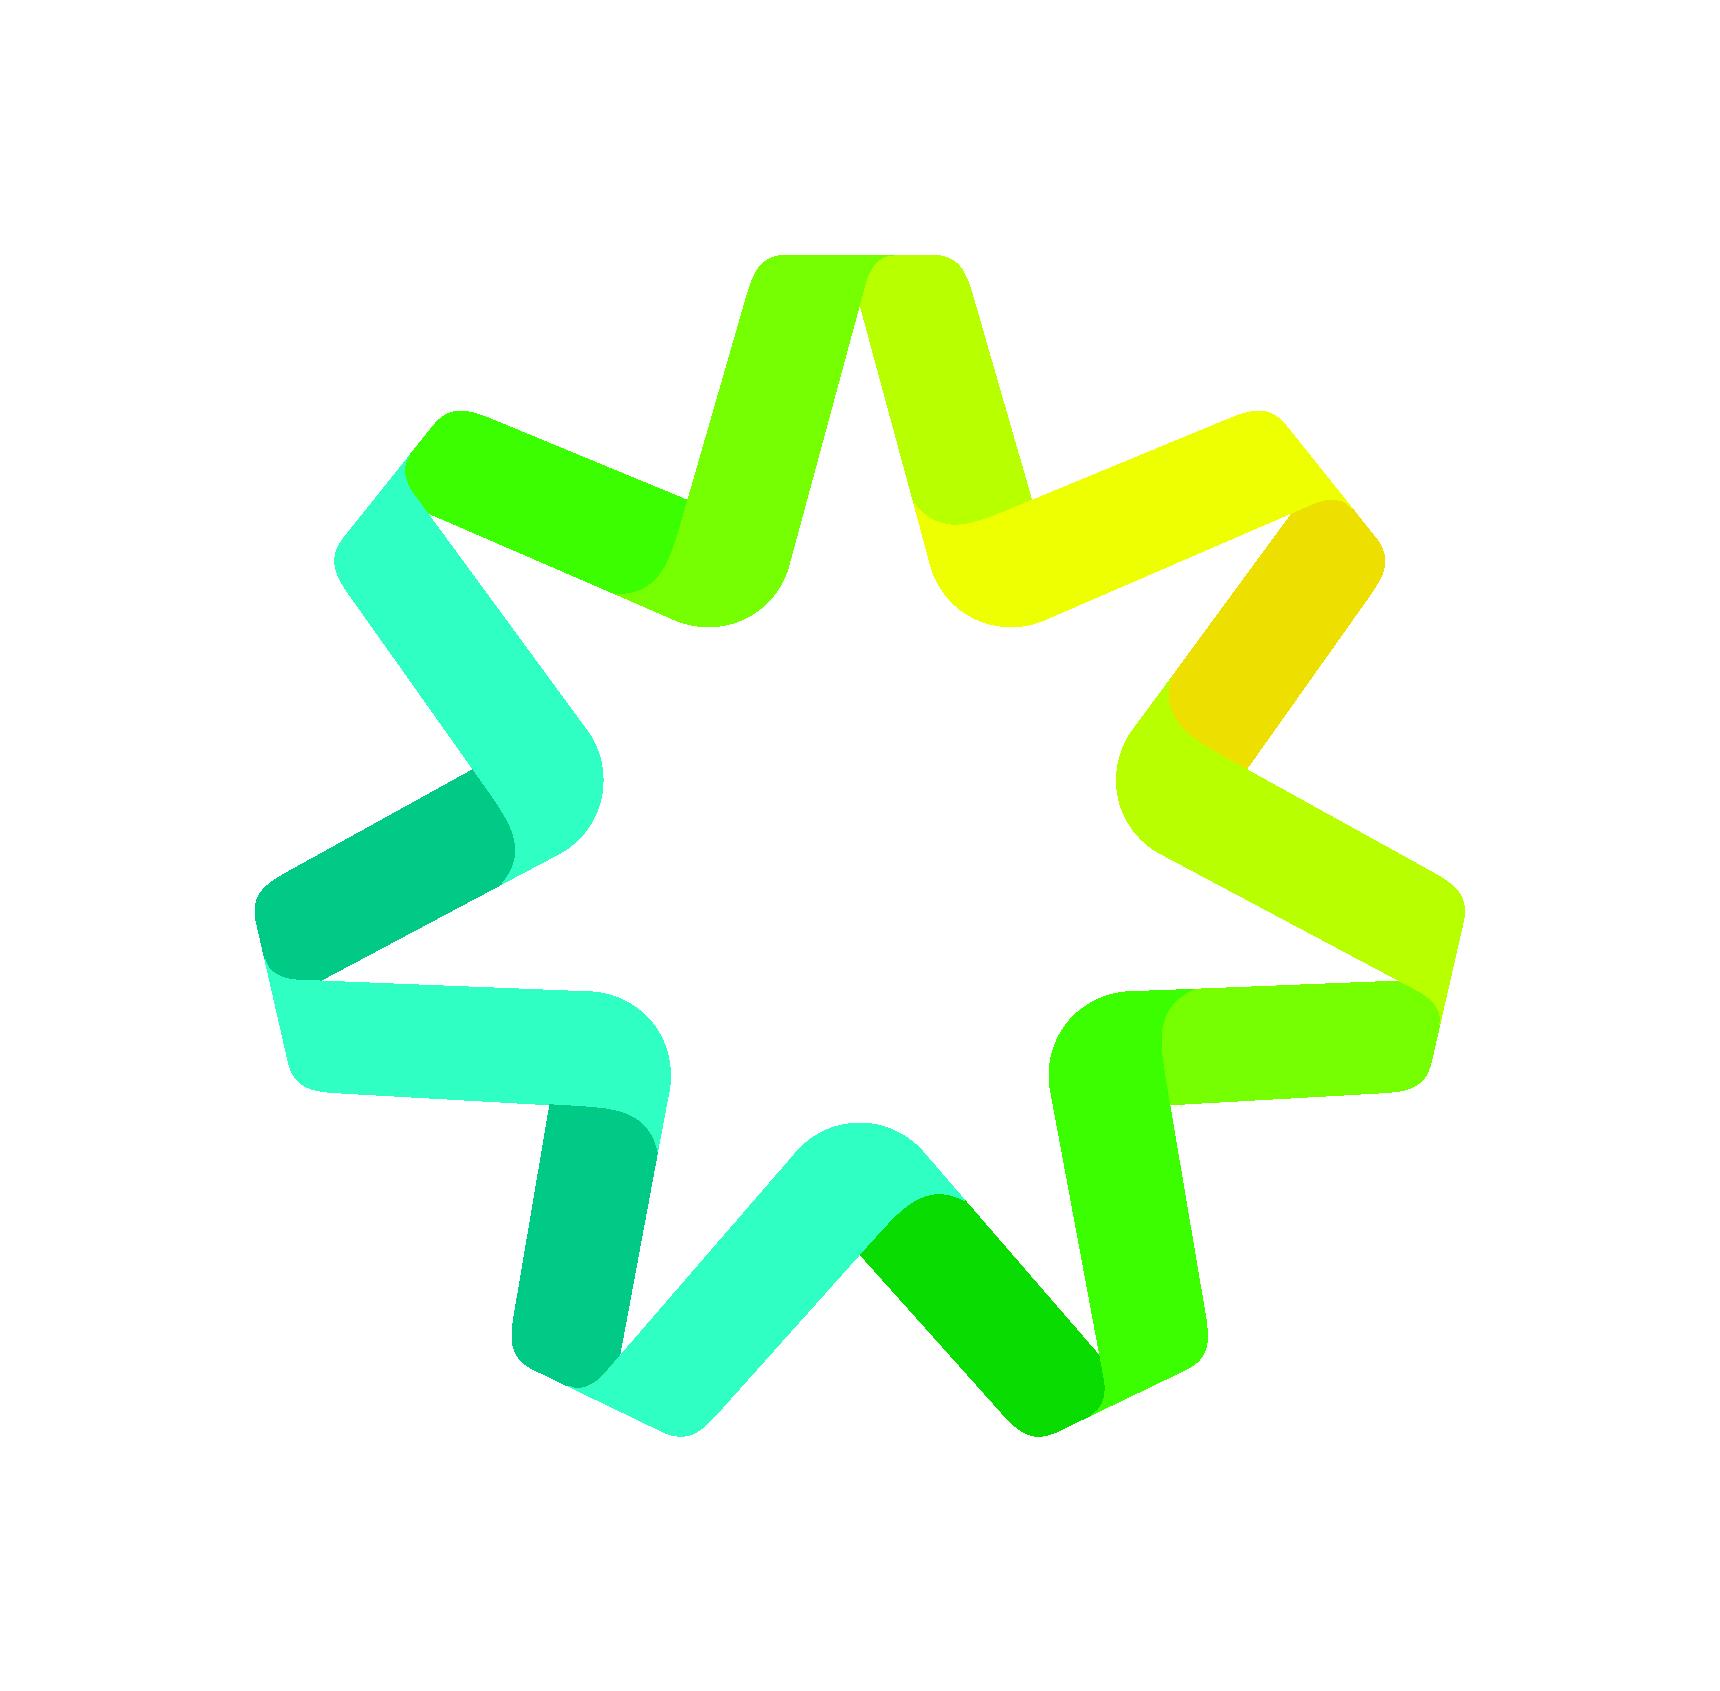 Centrelink Centrepay logo